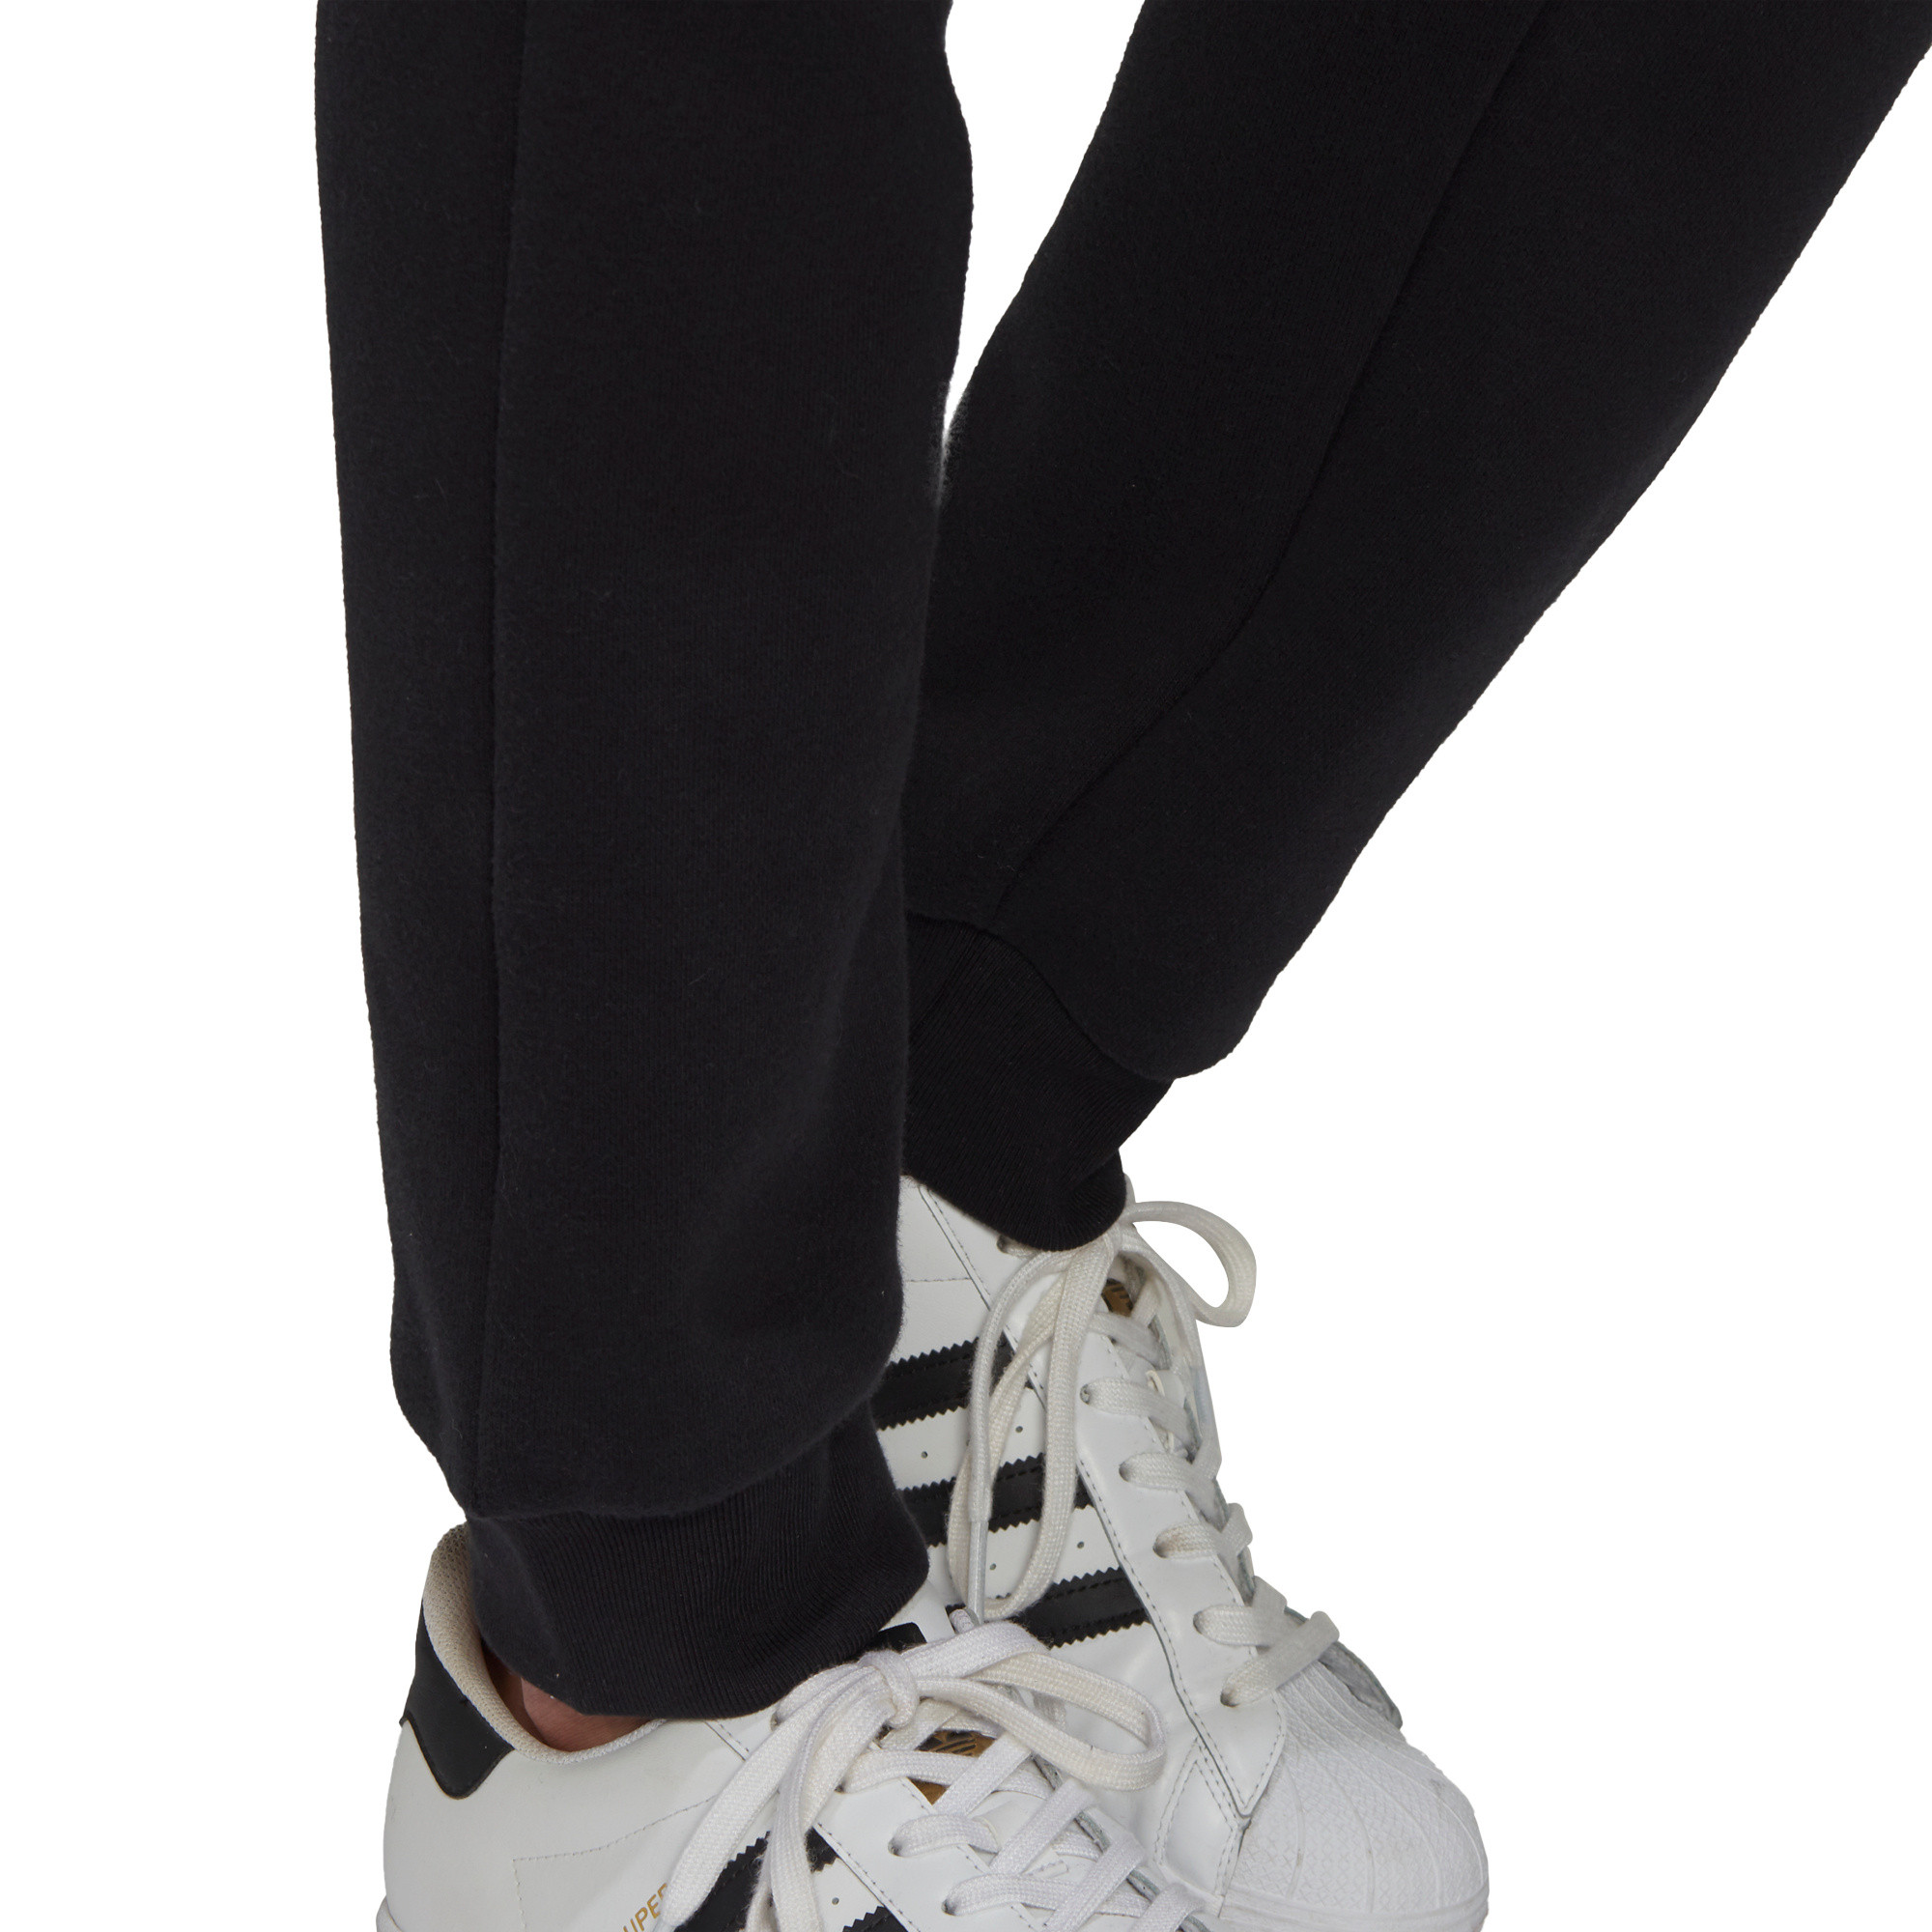 Pantaloni adicolor Essentials Trefoil, Nero, large image number 3